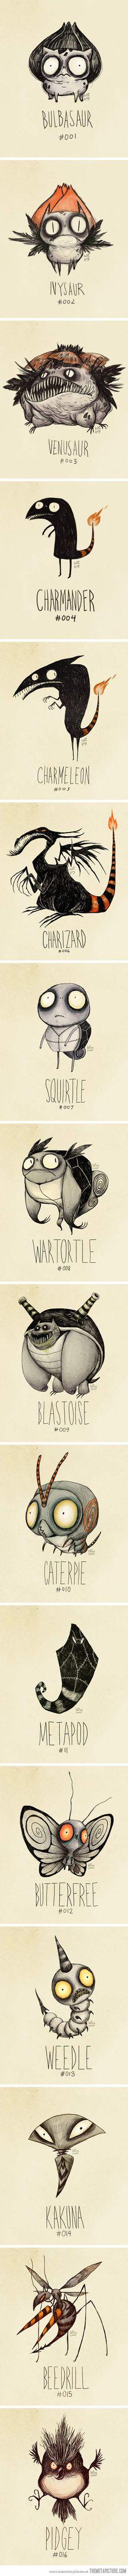 geek, pokemon, art, awesom, tim burton, illustr, burton style, drawn, timburton